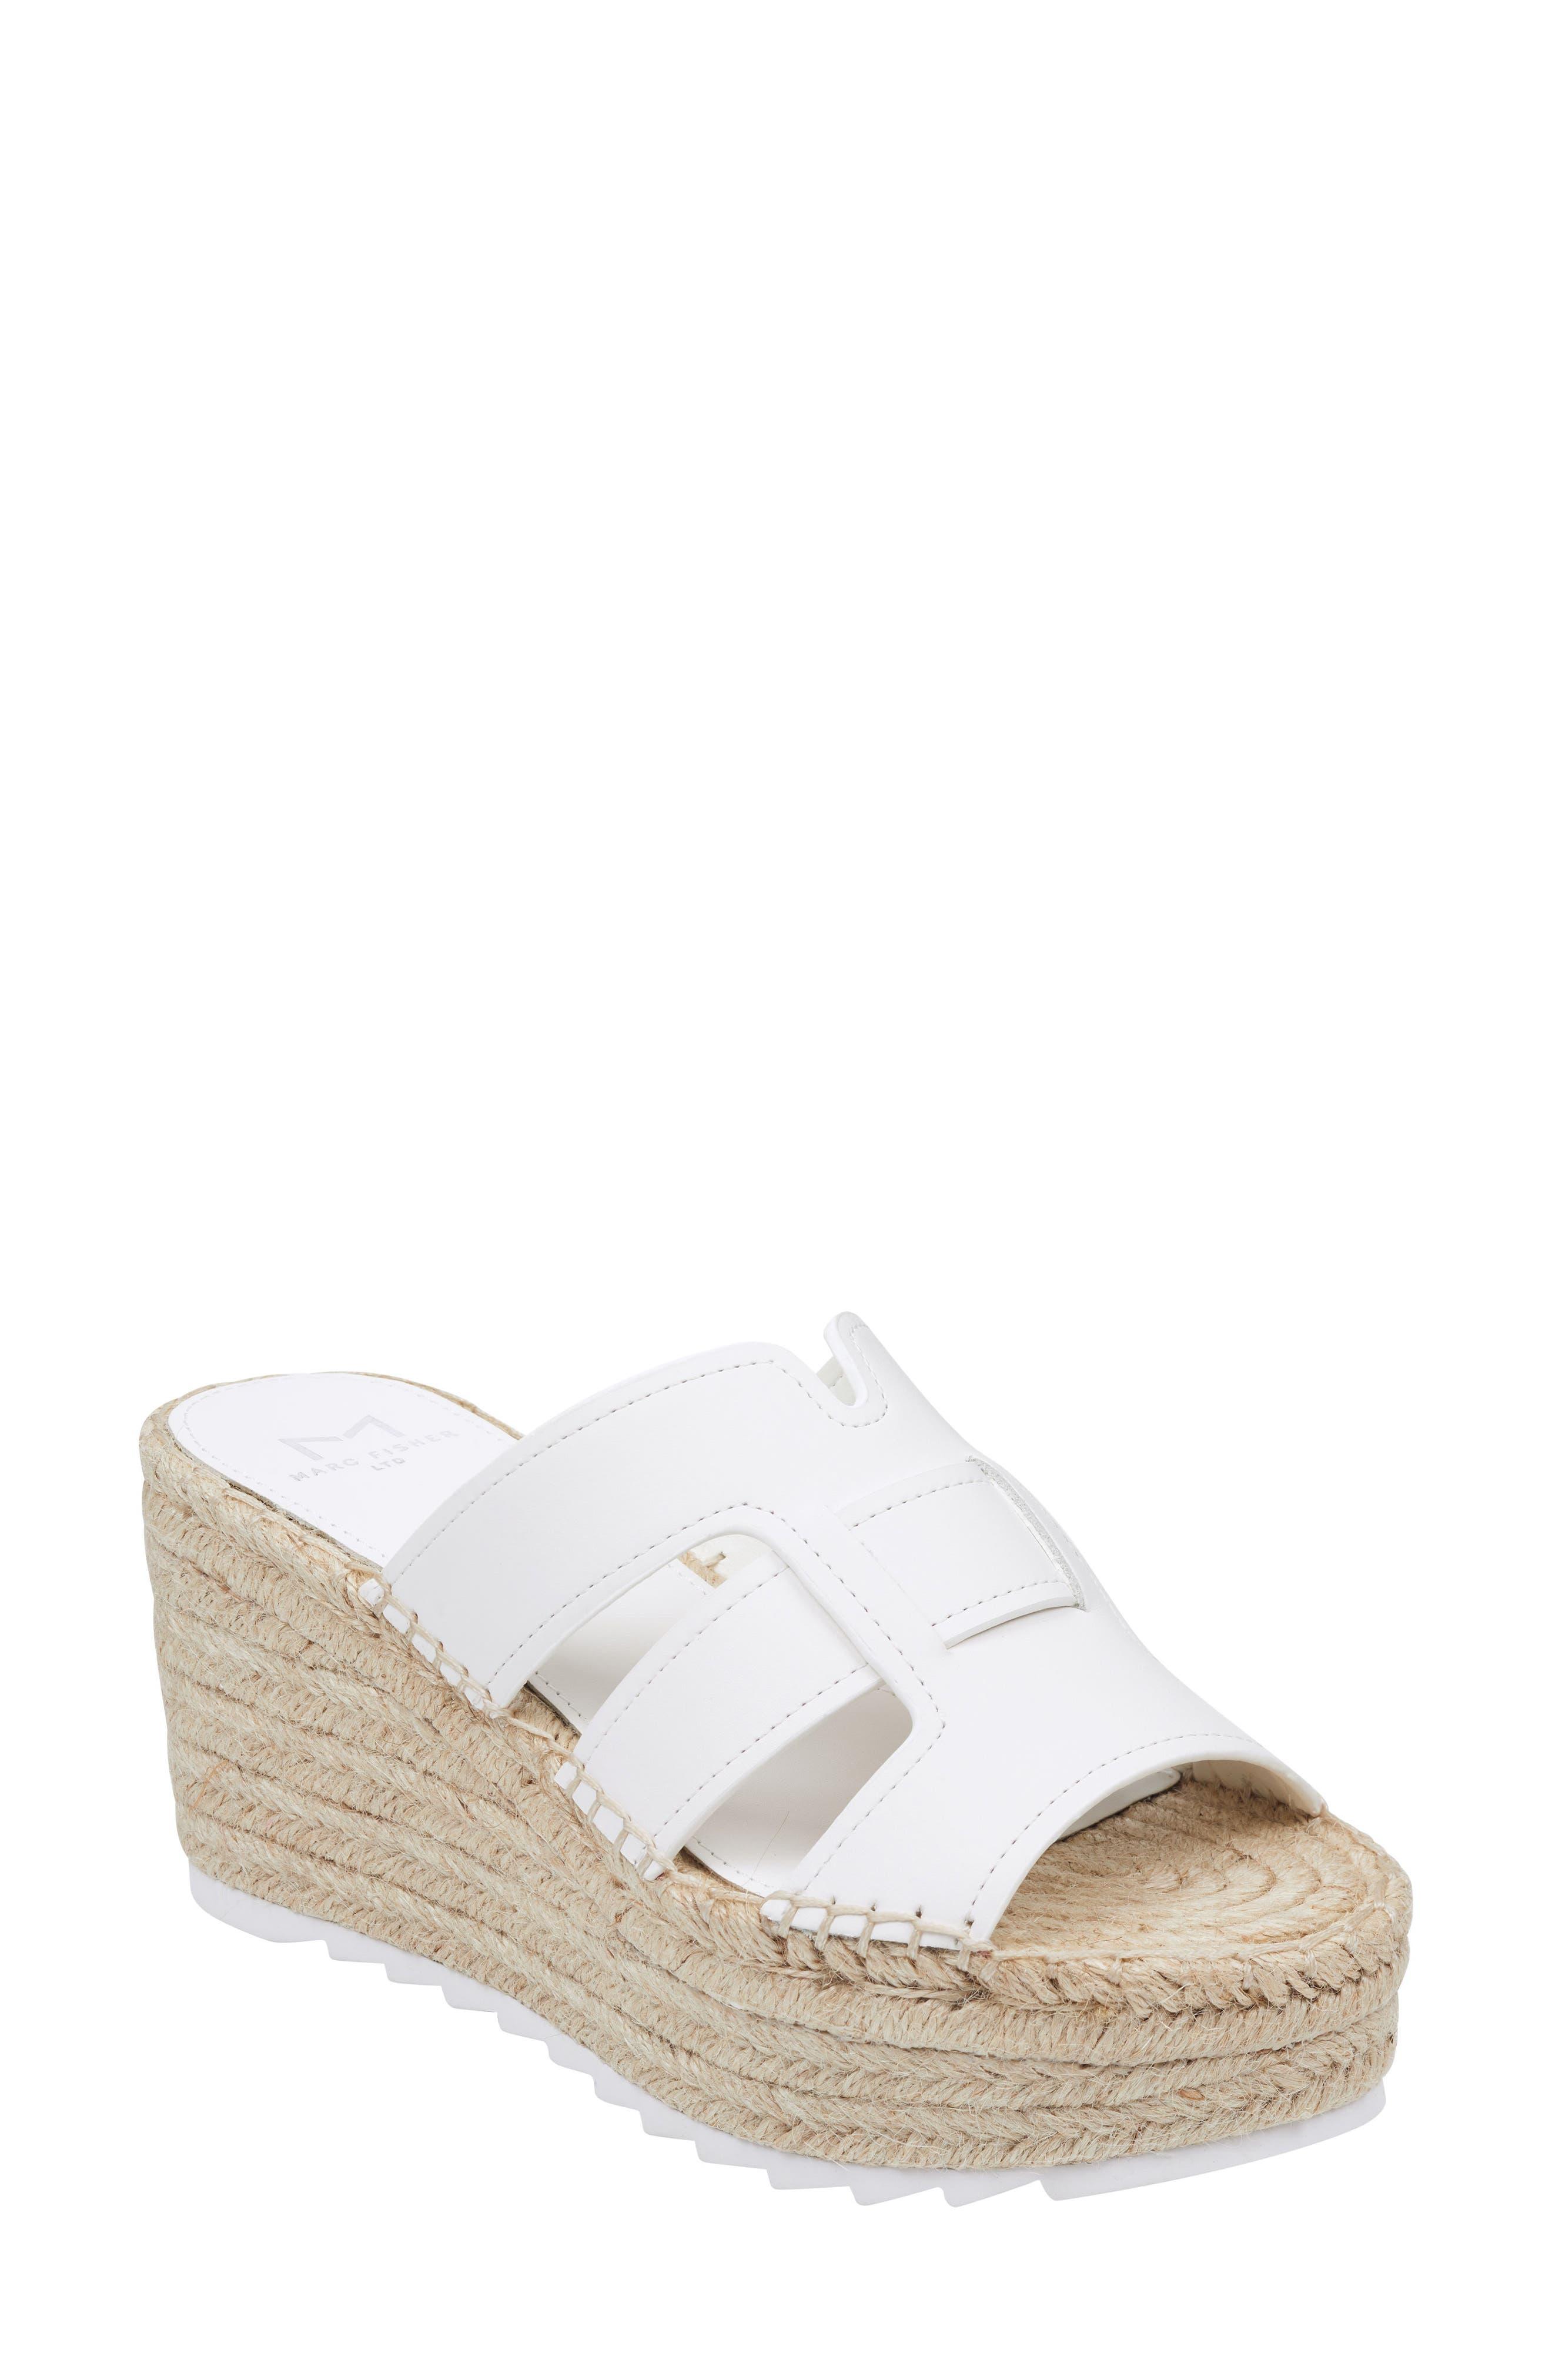 45400bfbae2e Women s Marc Fisher LTD Wedge Sandals